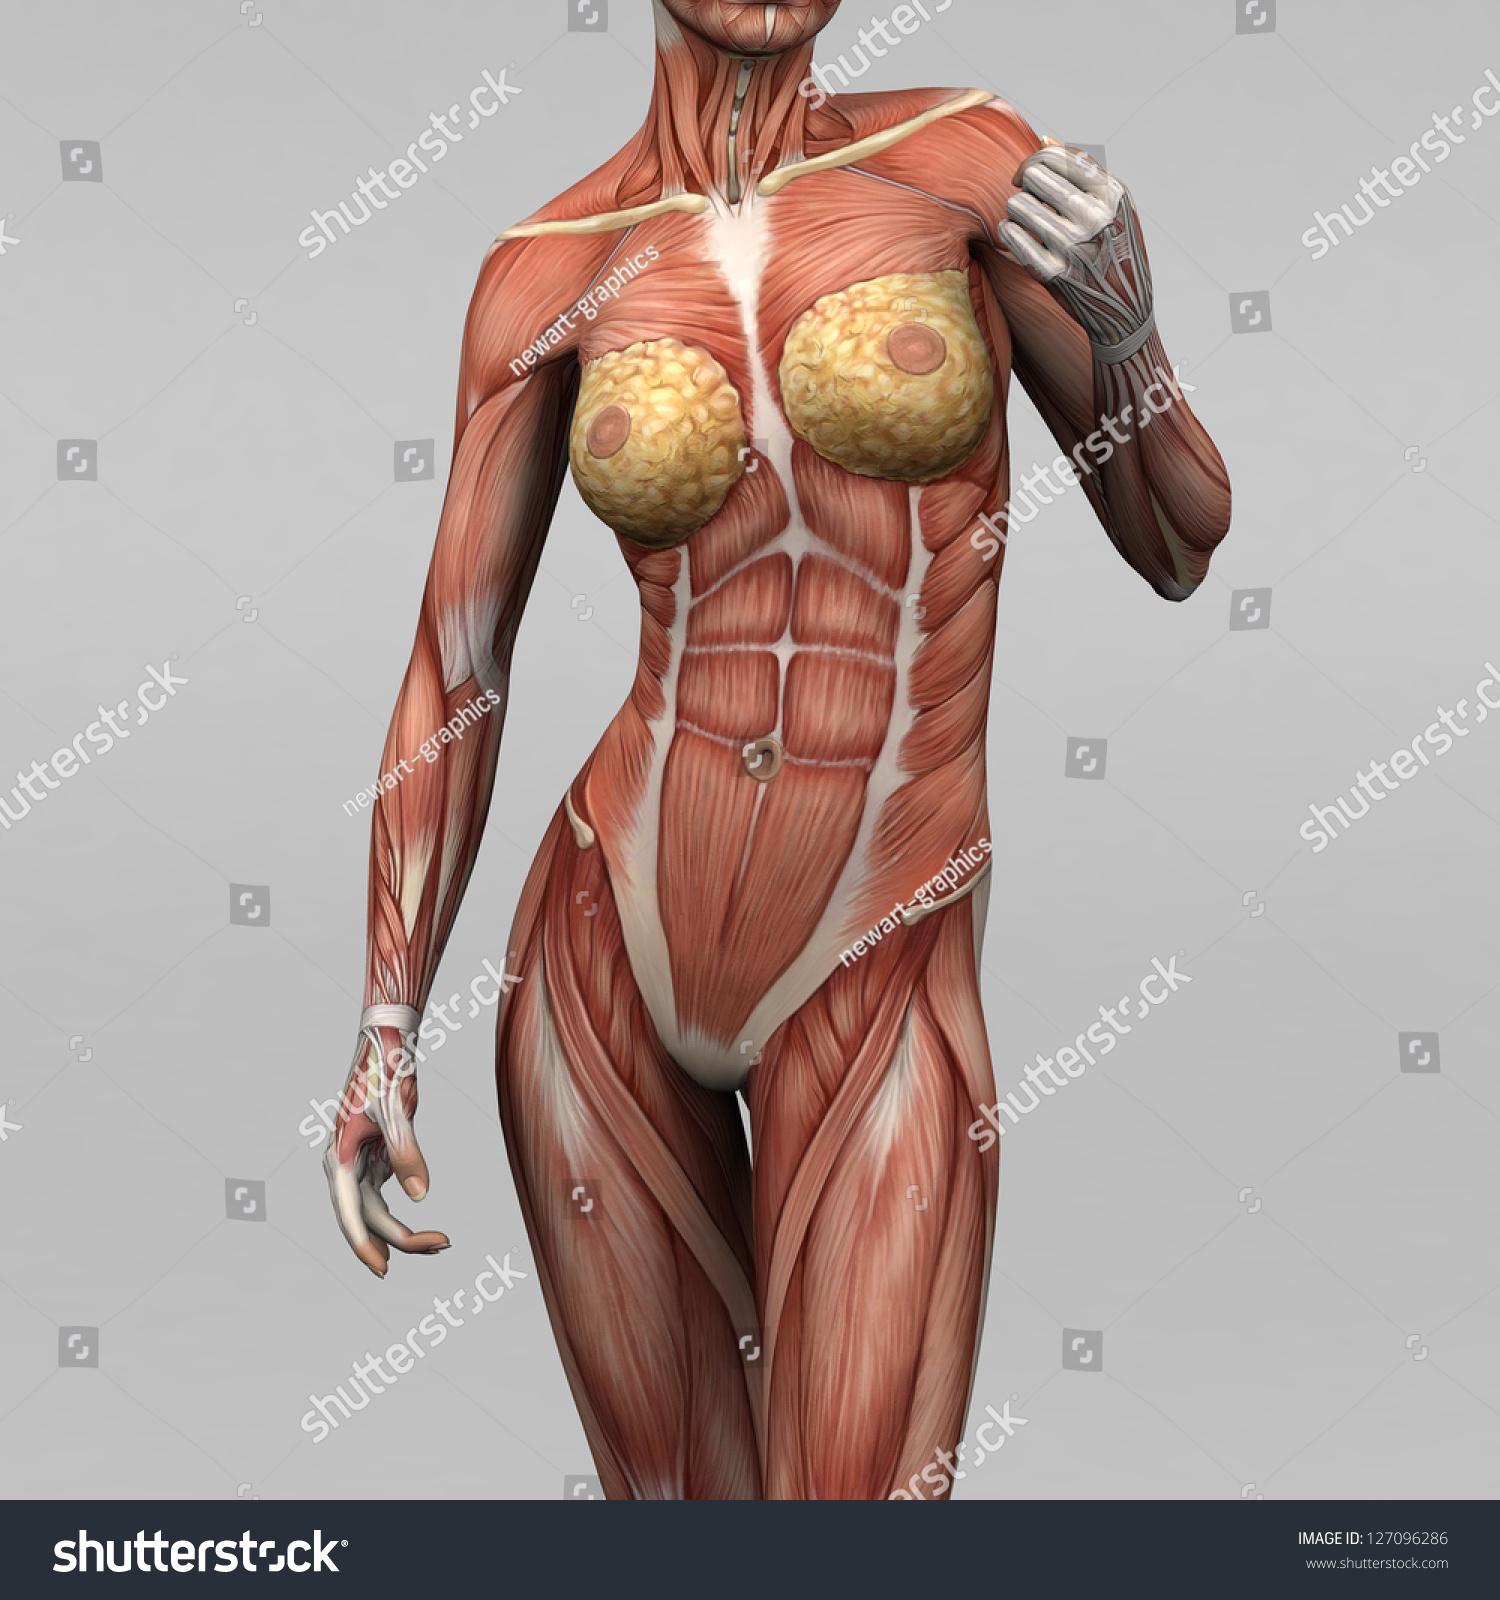 Female Human Anatomy Muscles Stockillustration 127096286 Shutterstock